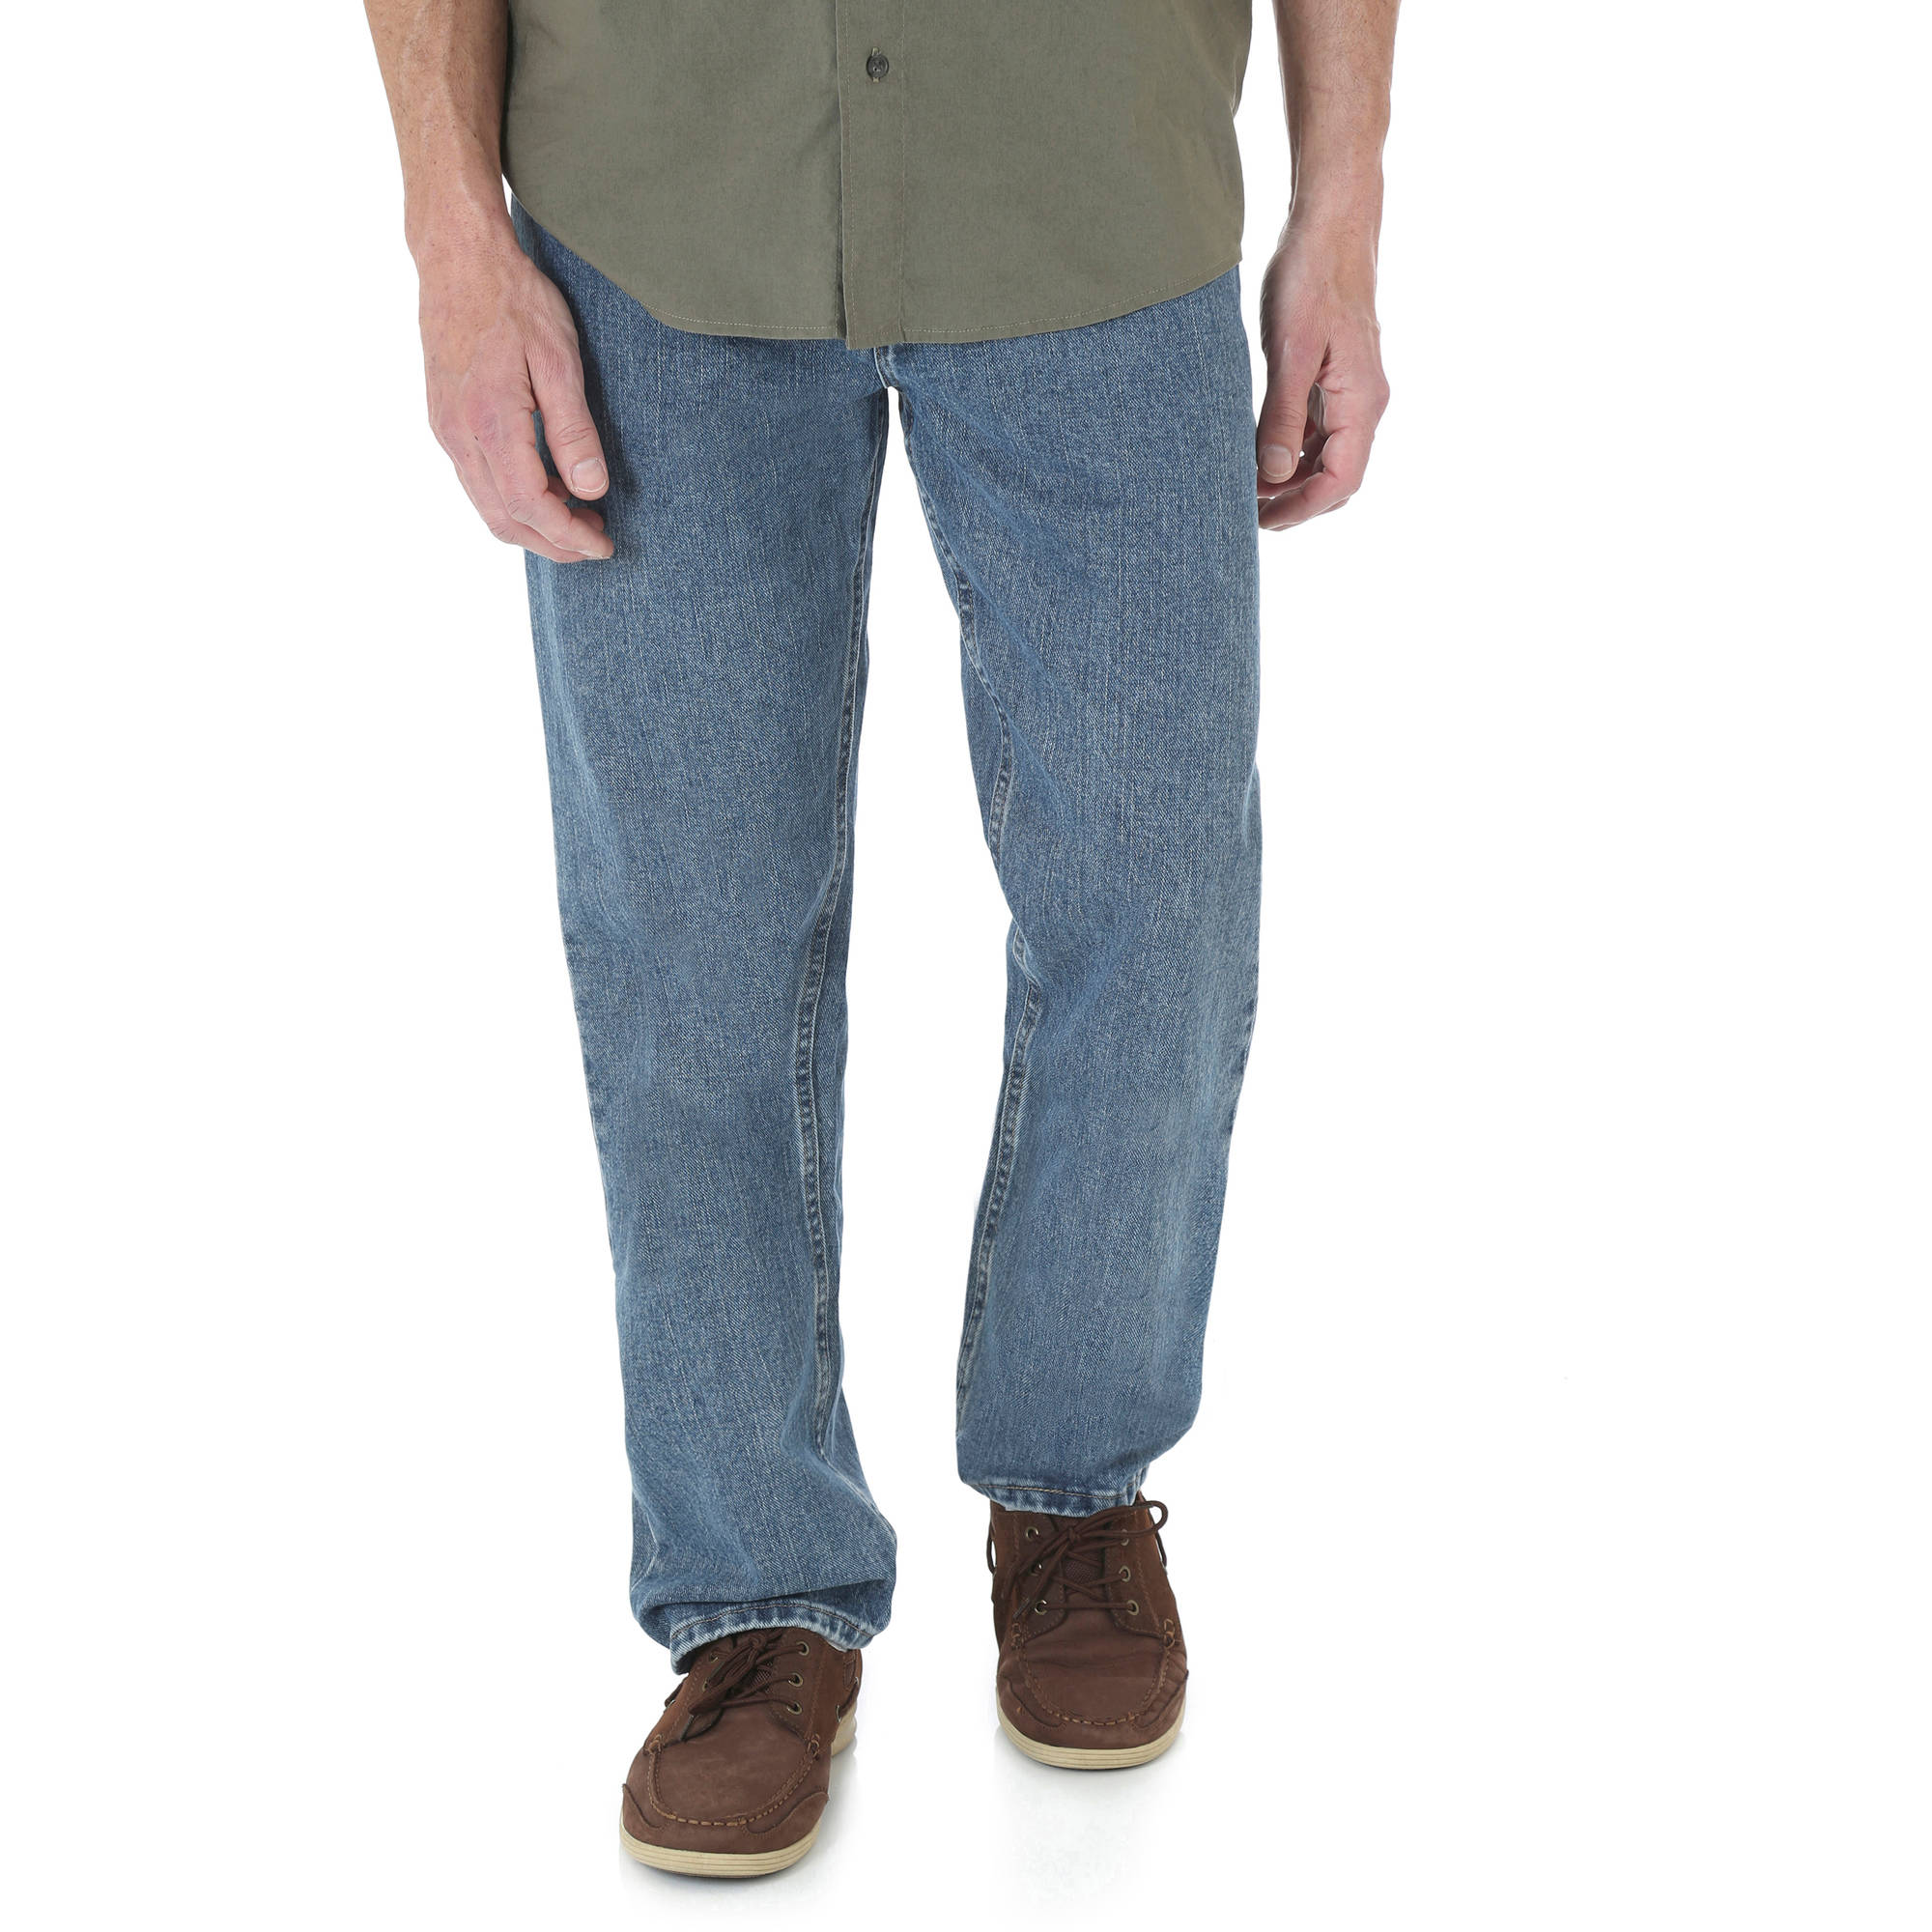 Mens Jeans 34x33